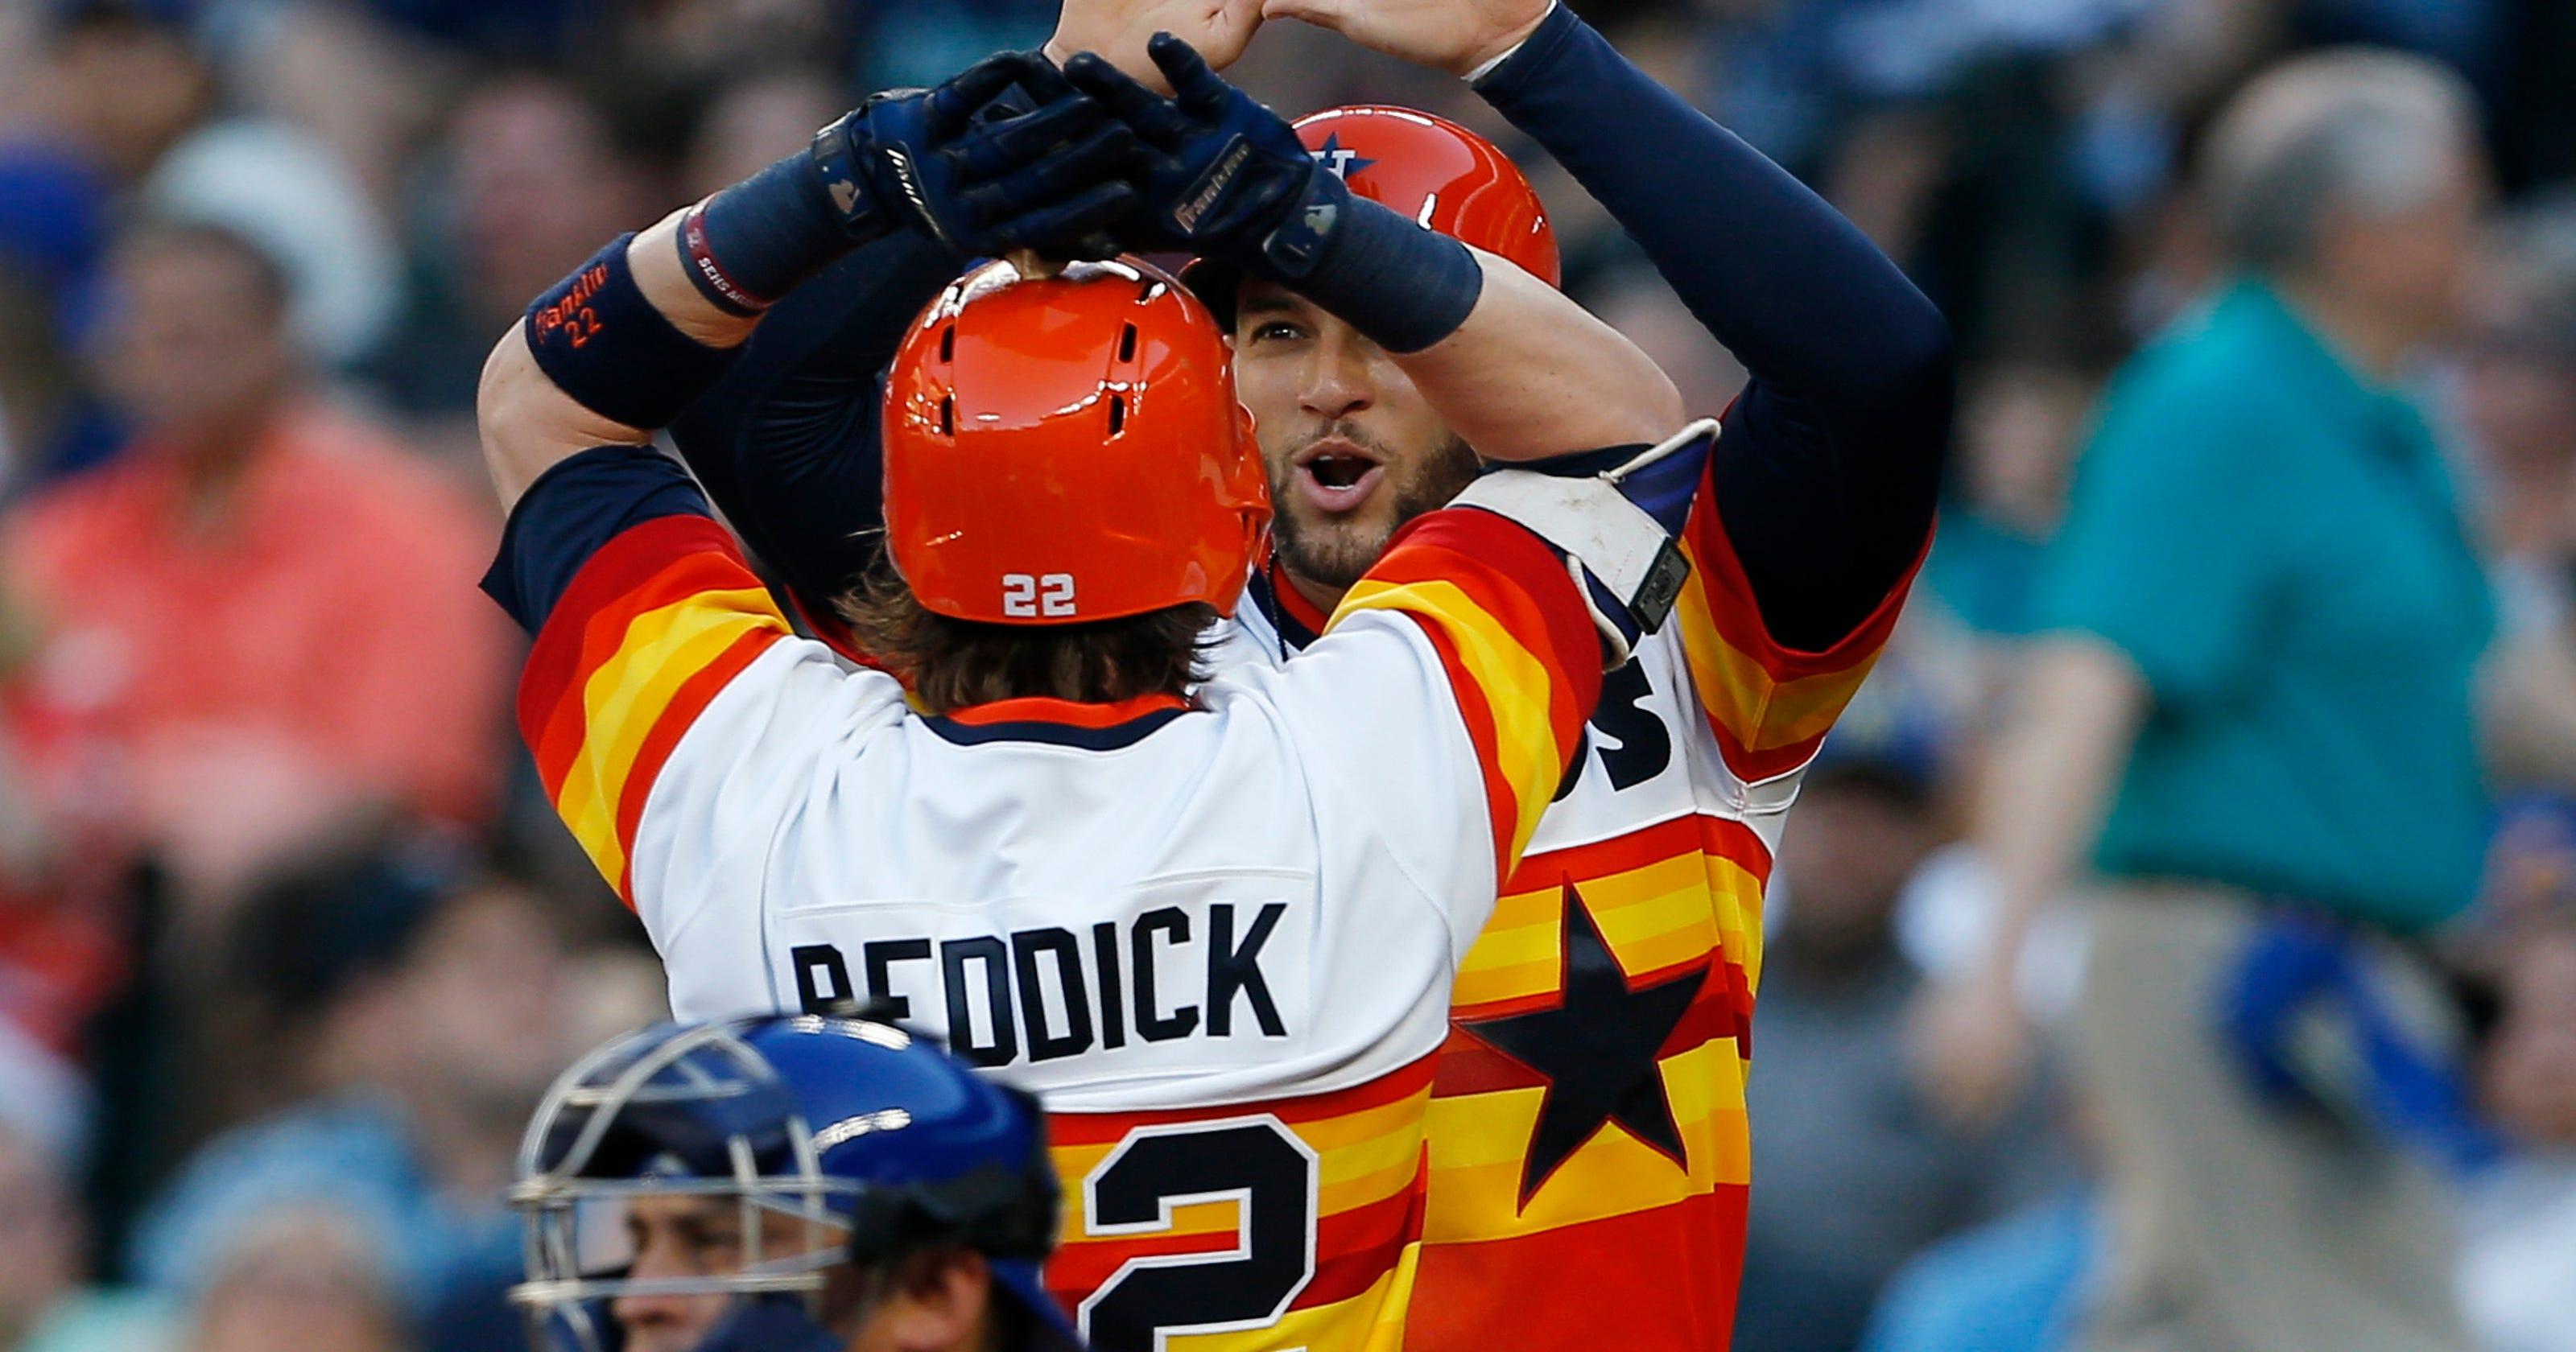 hot sale online 3794c 01a79 Rainbow resurgence: Bright Astros jerseys now a fan favorite